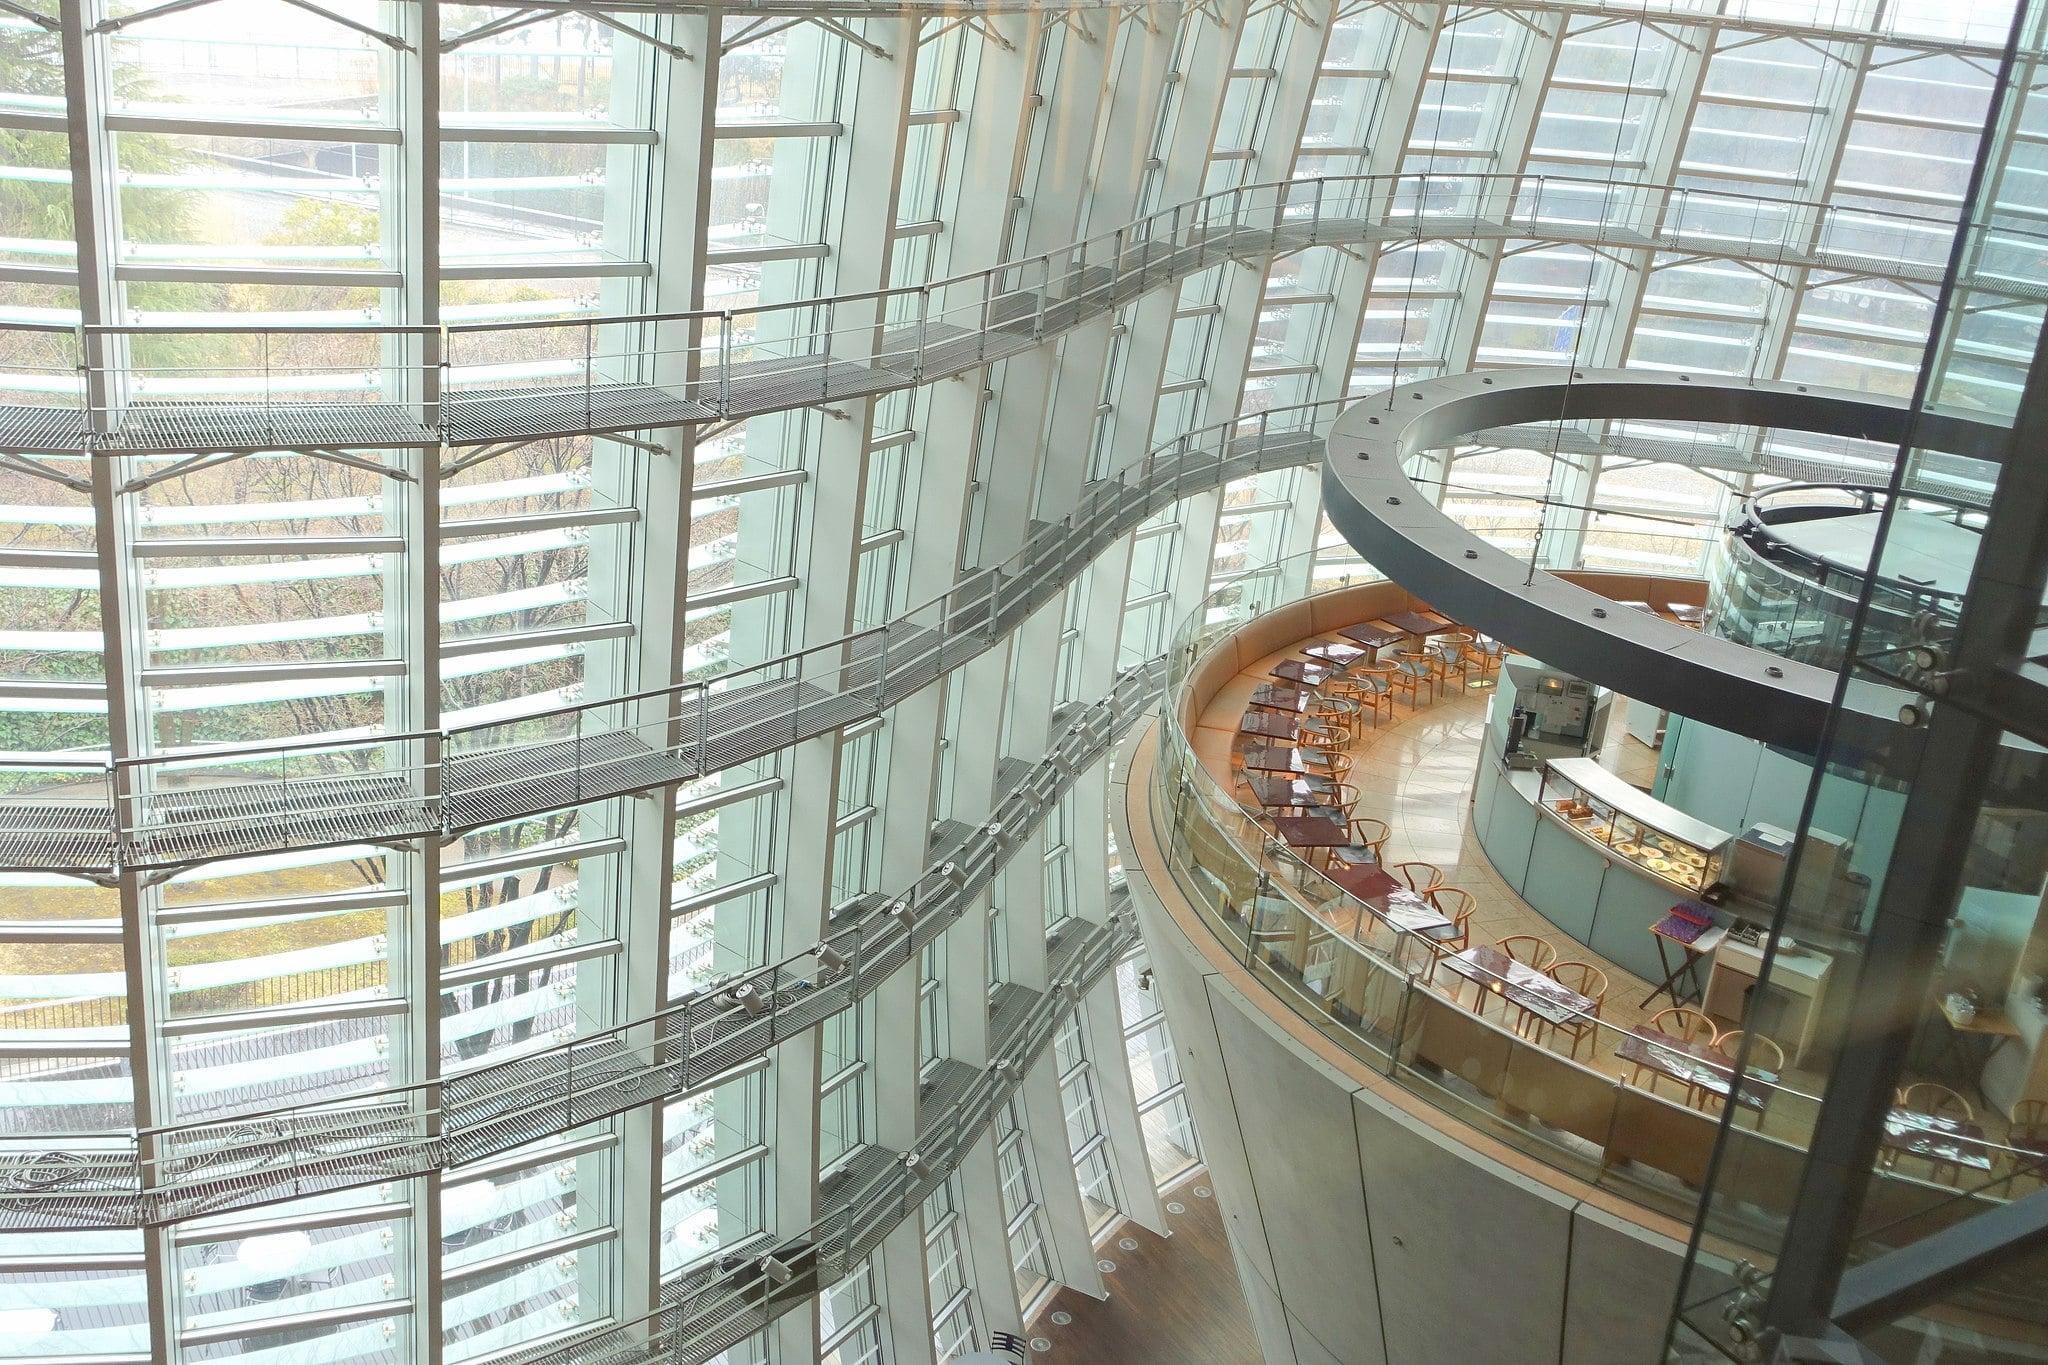 National_Art_Center,_Tokyo_-_DSC06717-min.JPG